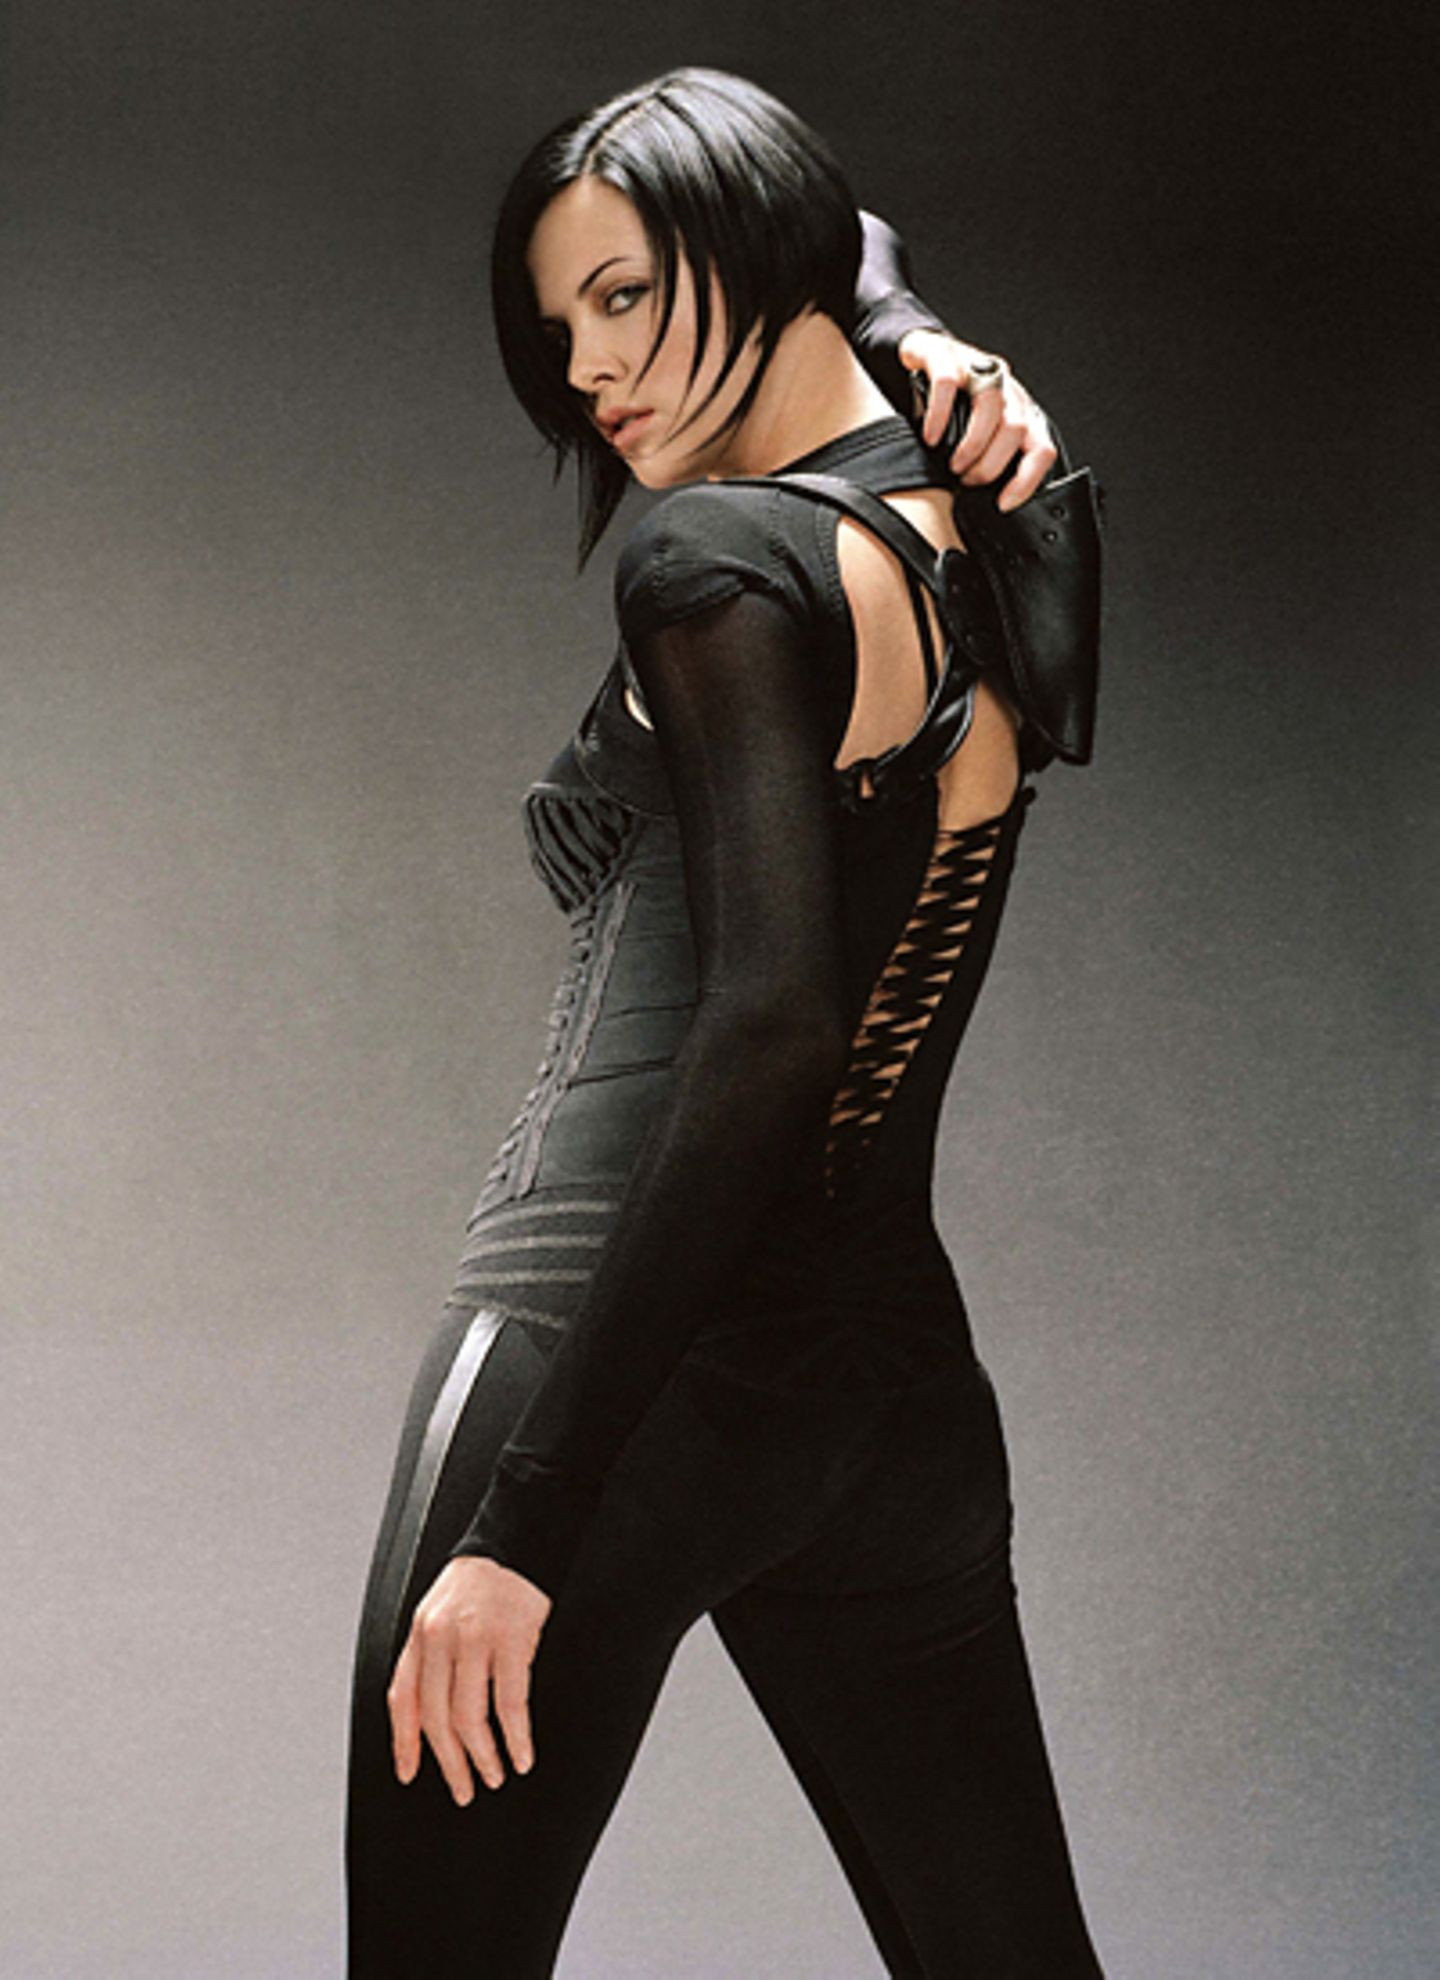 Aeon Flux - Charlize Theron - 2005